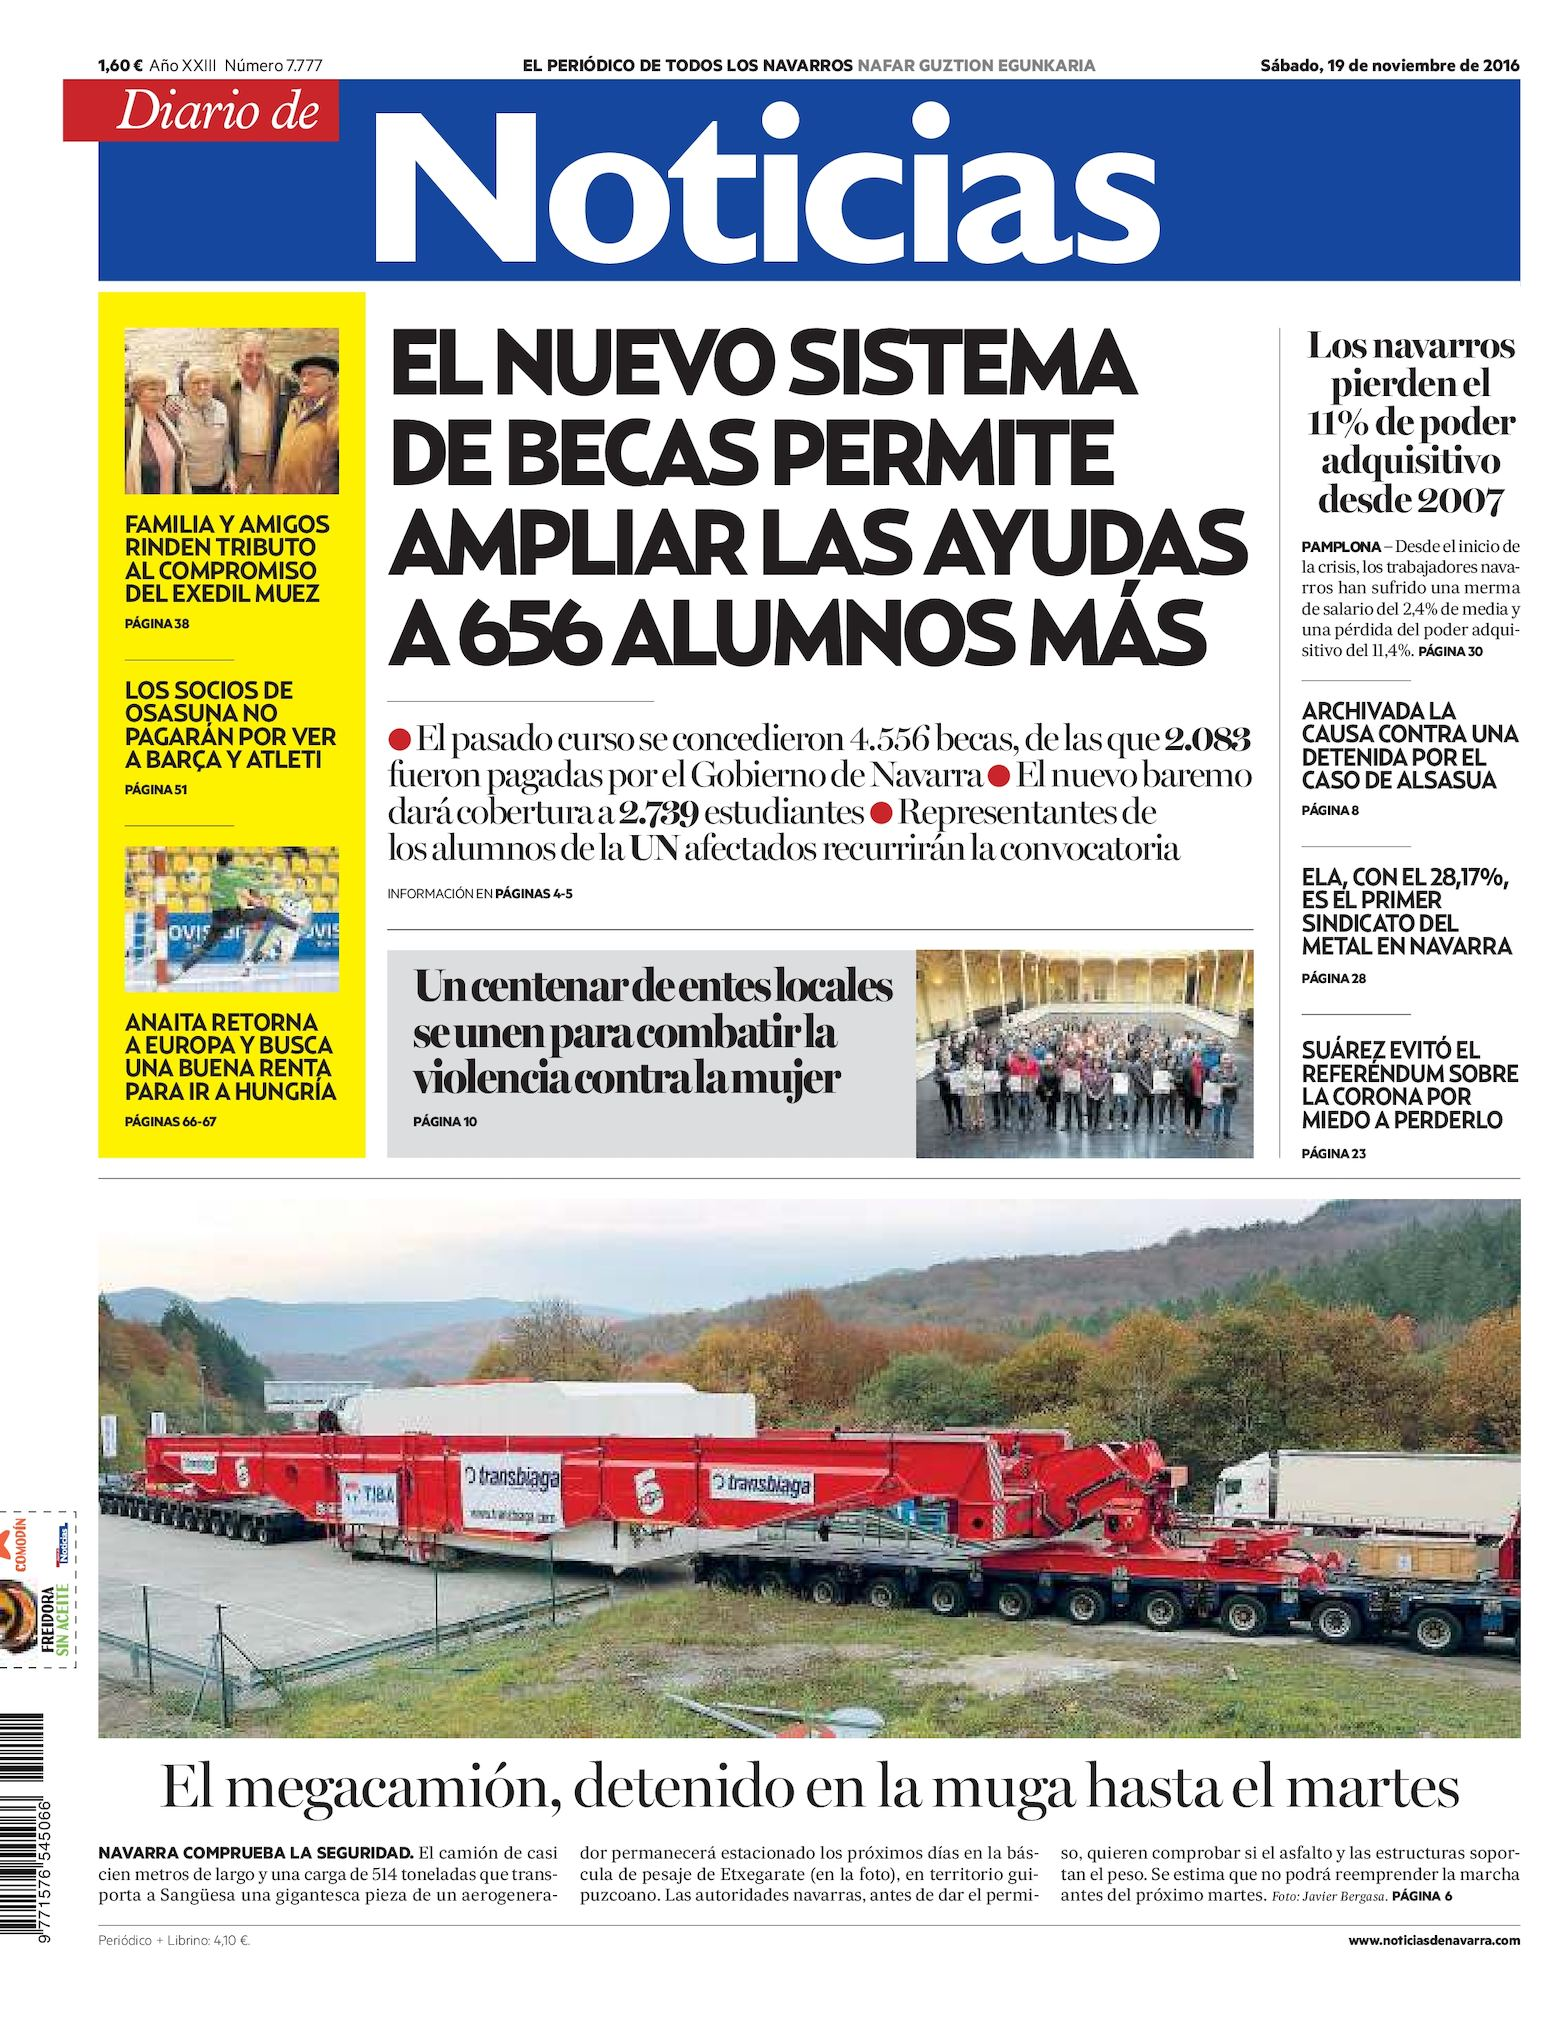 db45f324f95b Calaméo - Diario de Noticias 20161119